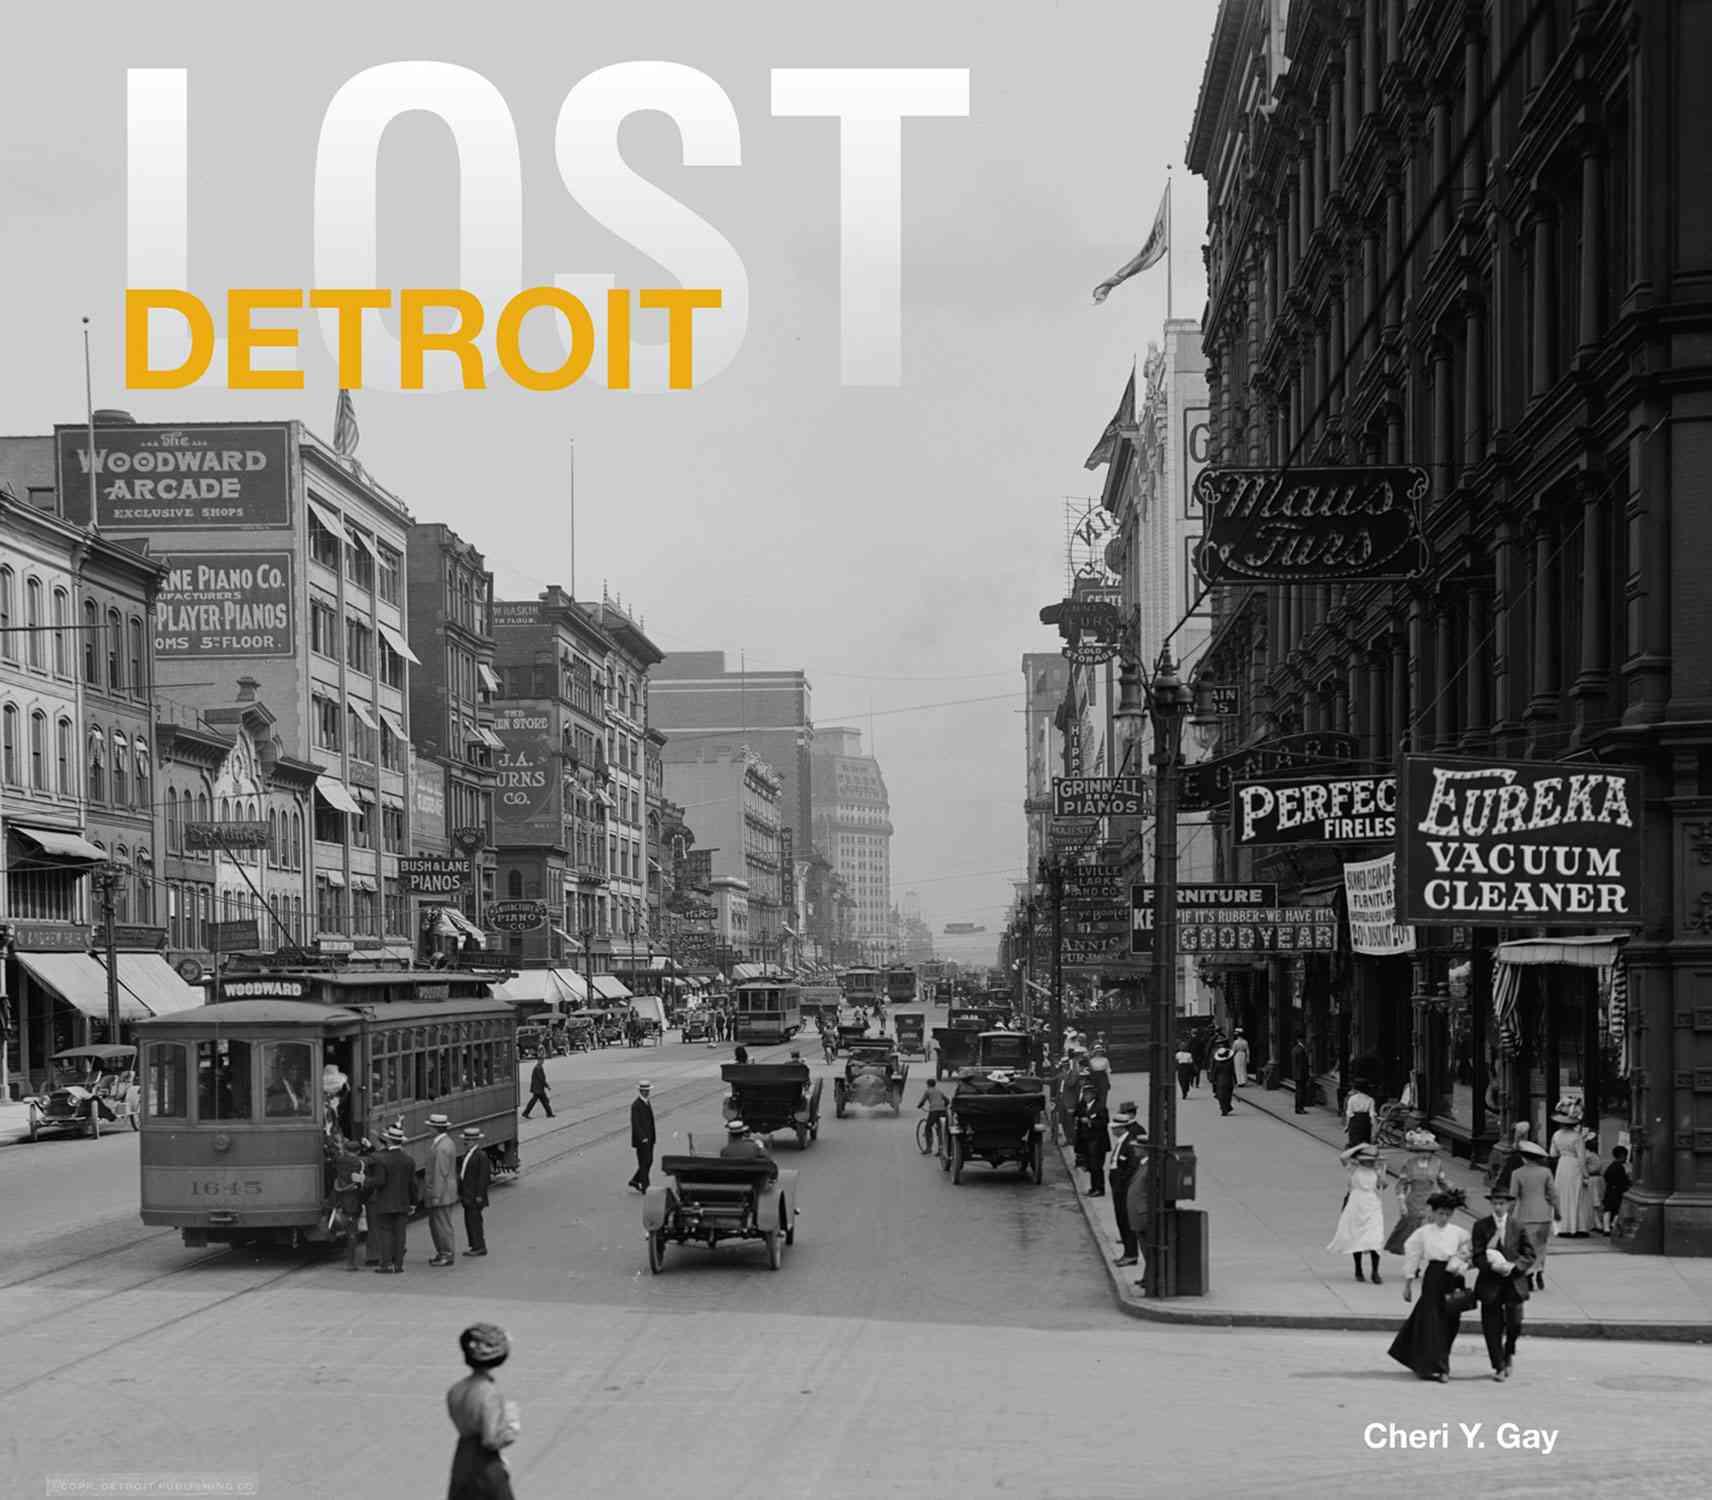 Lost Detroit By Gay, Cheri Y.